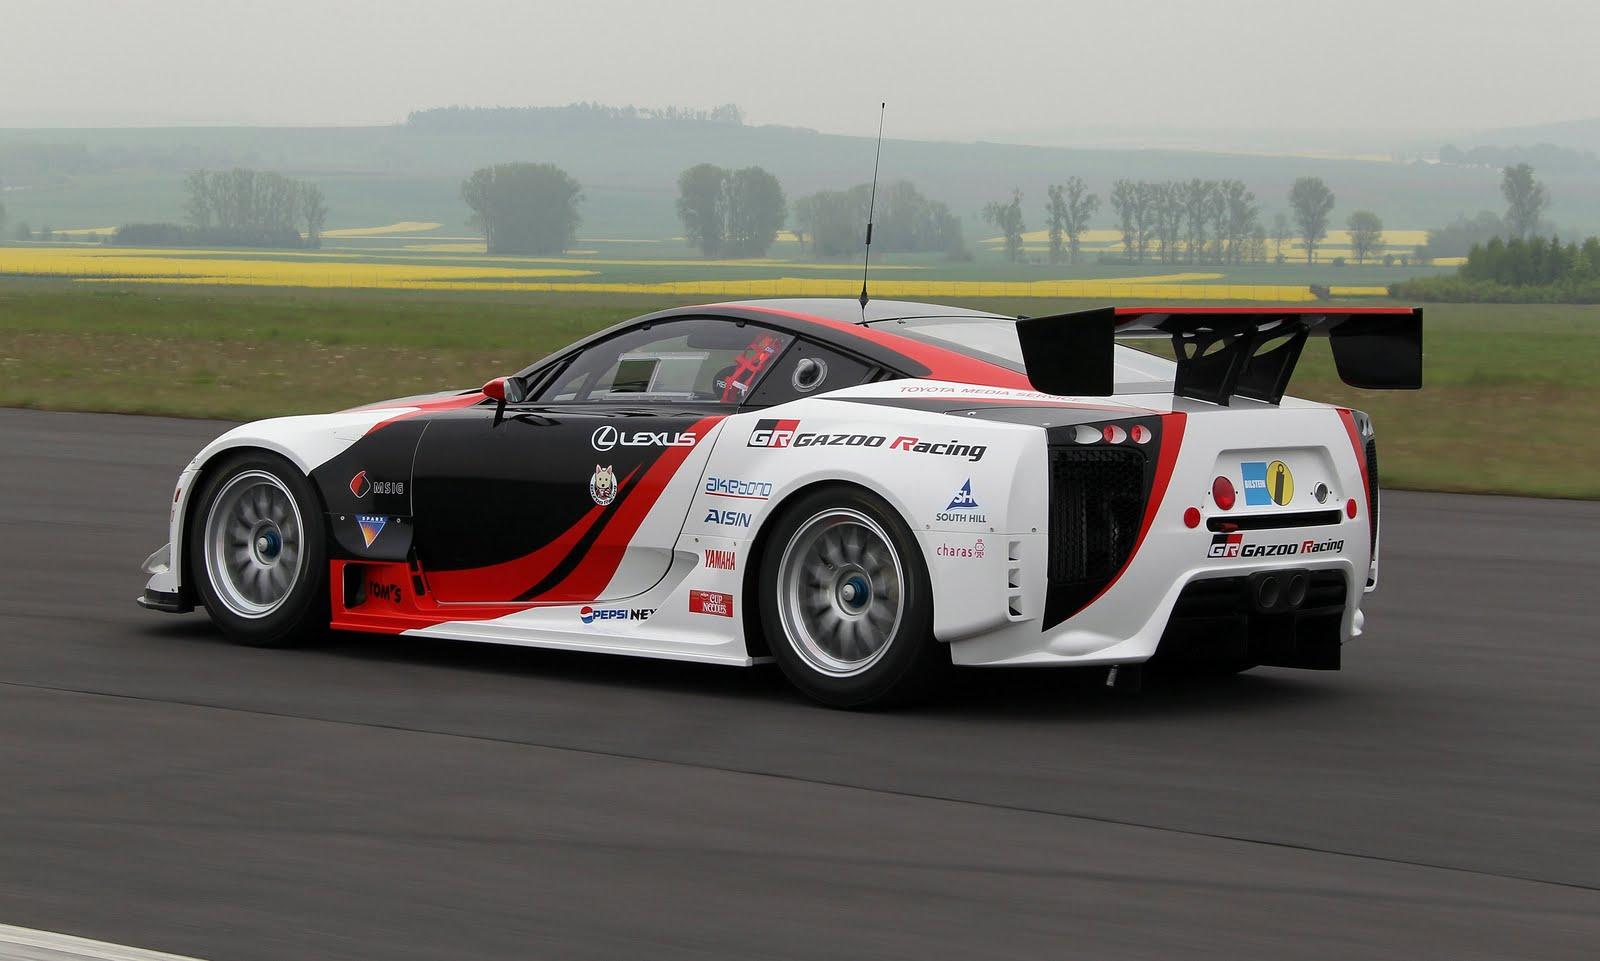 http://1.bp.blogspot.com/-0UVezhjC4mY/TcOS6OE6UCI/AAAAAAAABBk/IFjYfK7bWO4/s1600/lexus-lfa-racing-04.jpg